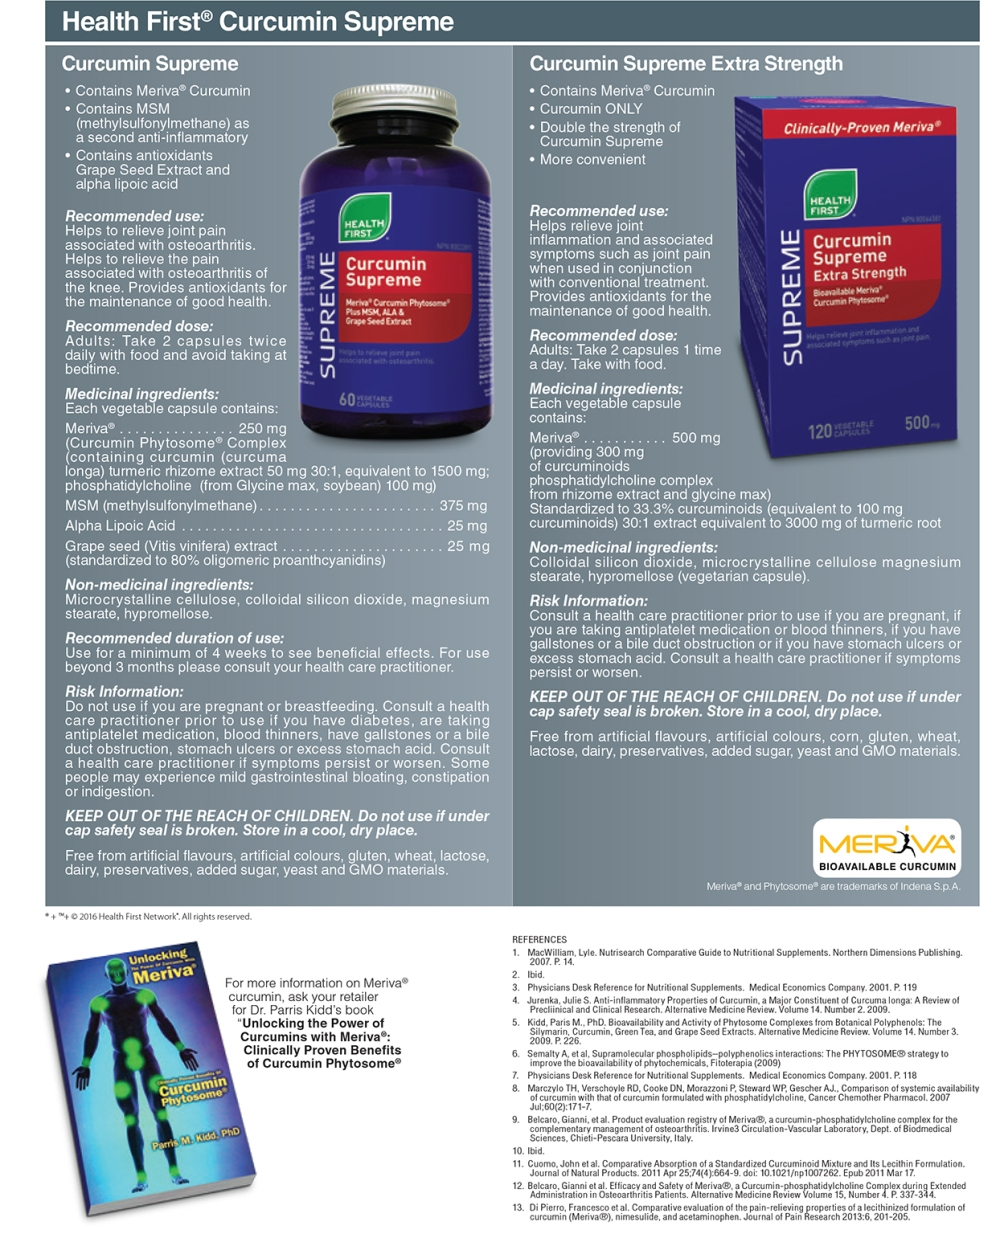 HF Alert 33 (Curcumin Supreme Extra) ENG - Email-3